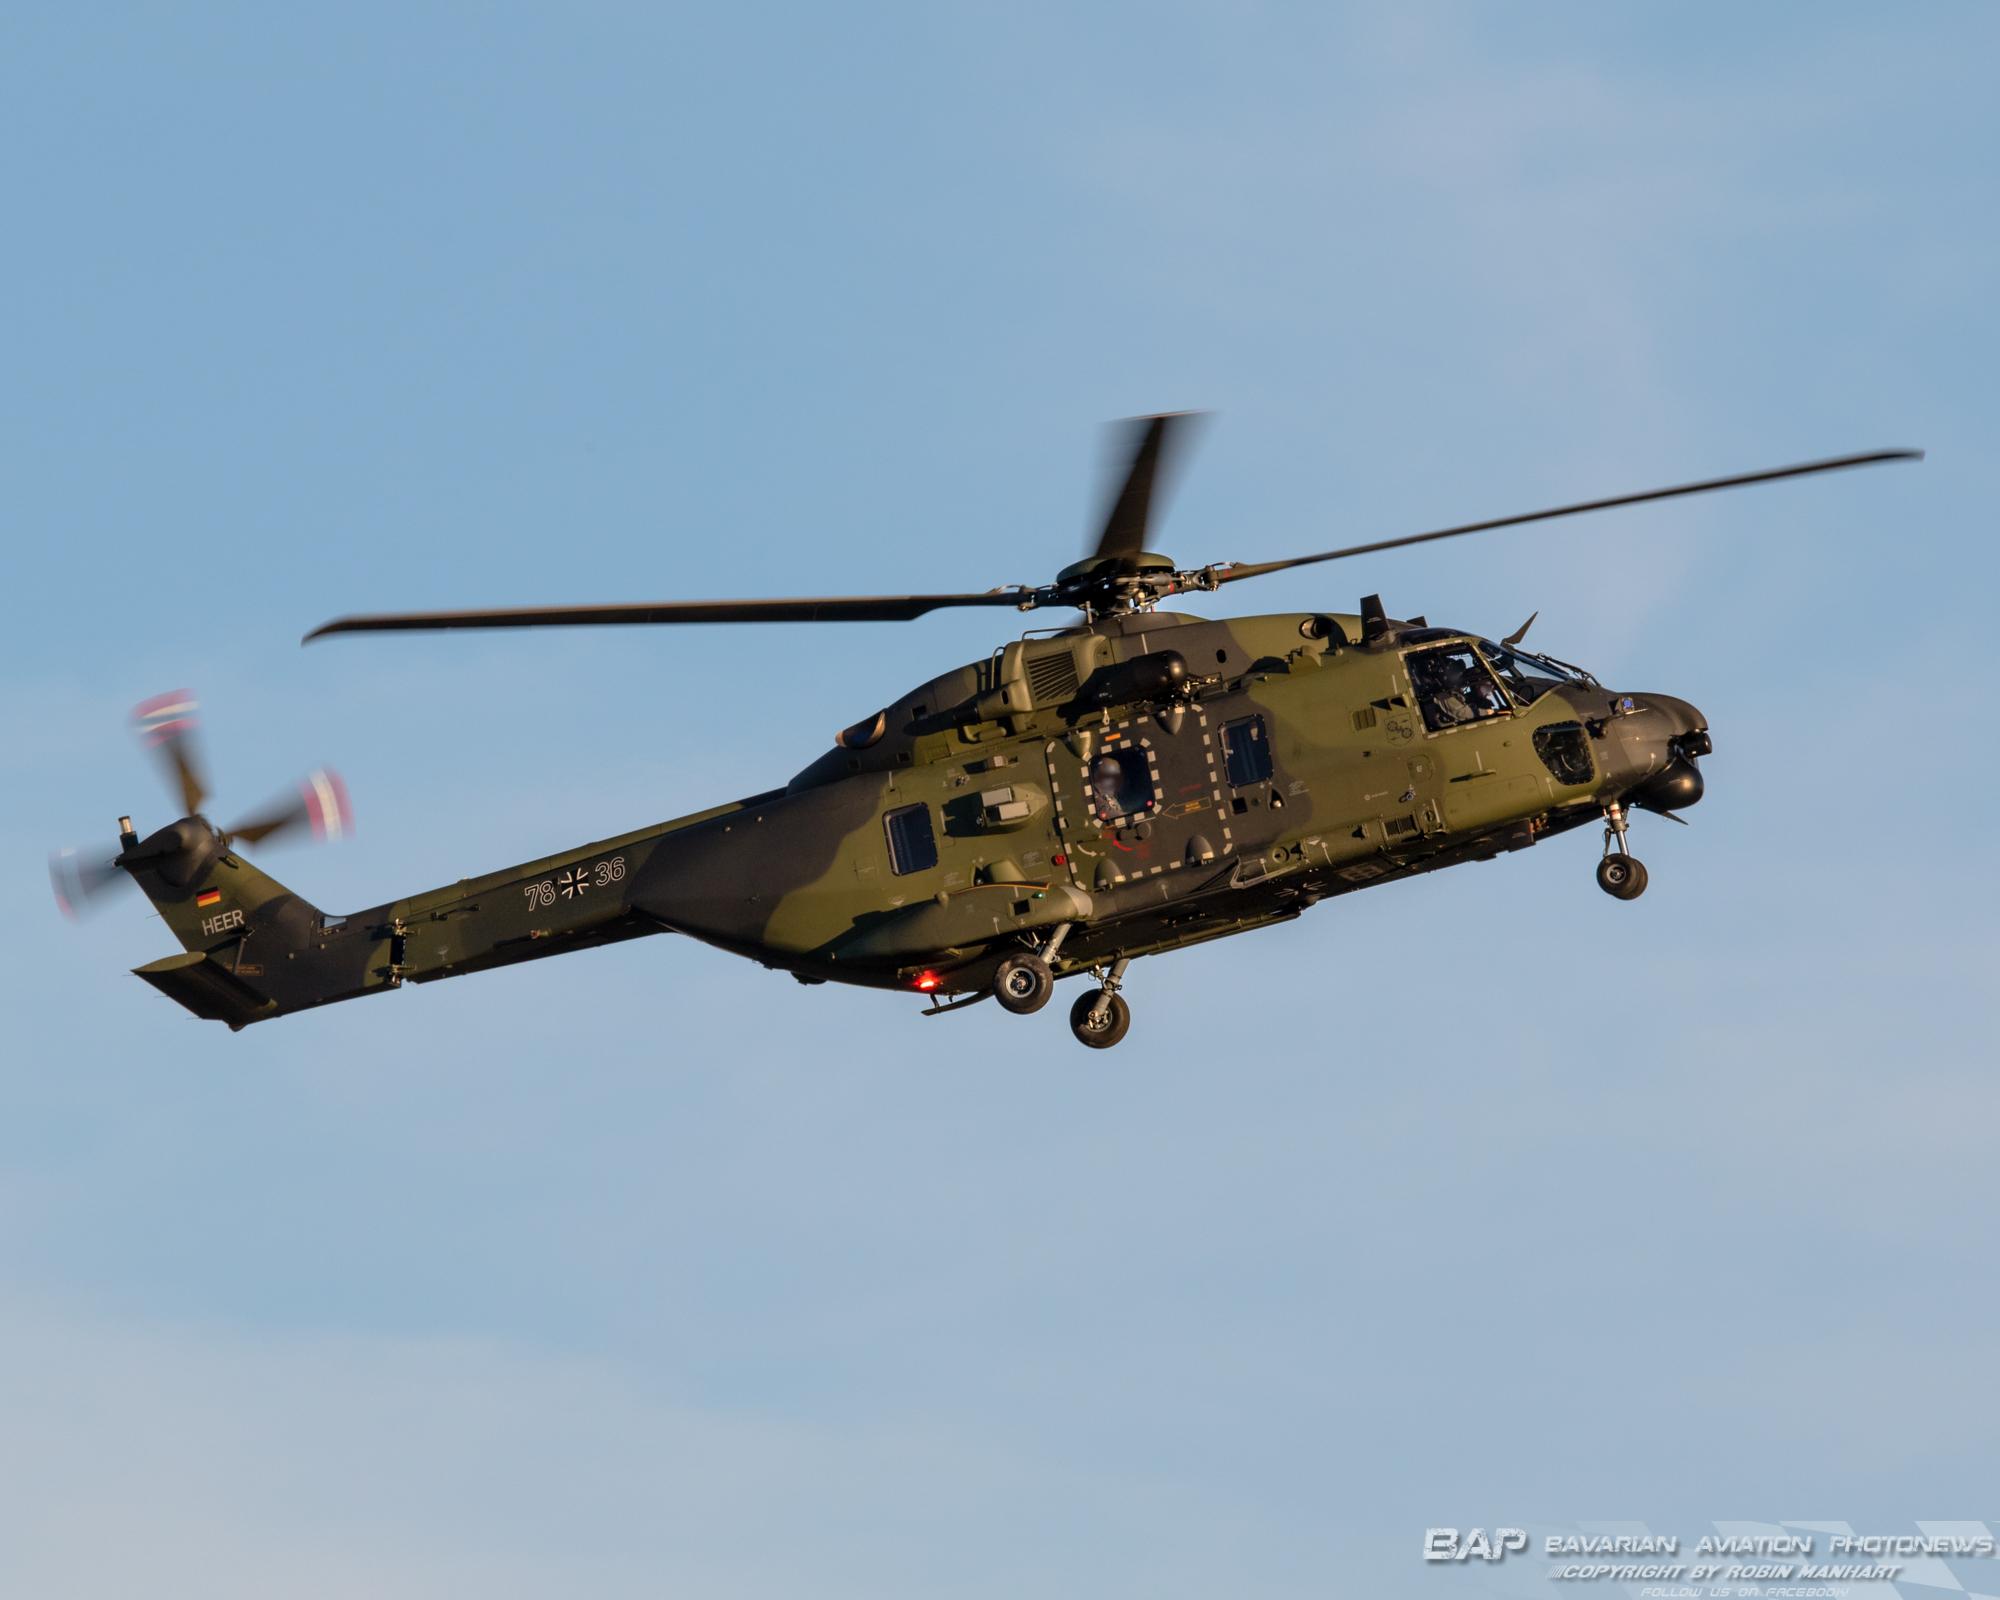 78+36 NH90 TTH THR30 GAA;